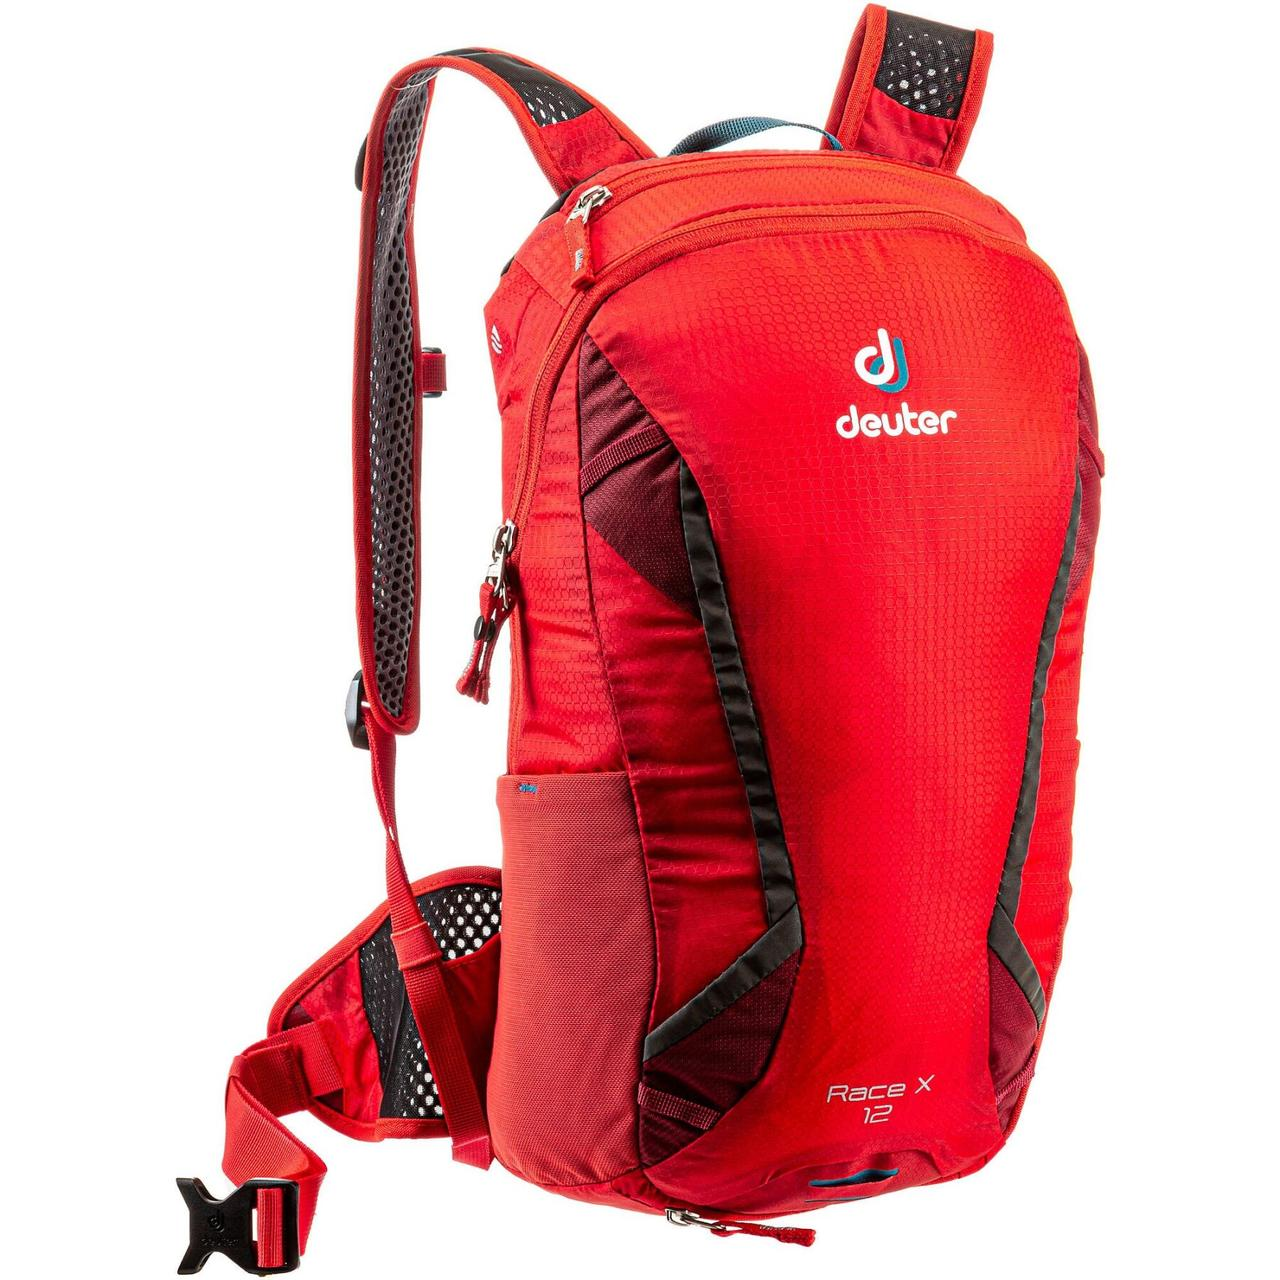 Велорюкзак Deuter Race X 12 chili-cranberry (3207118 5557)